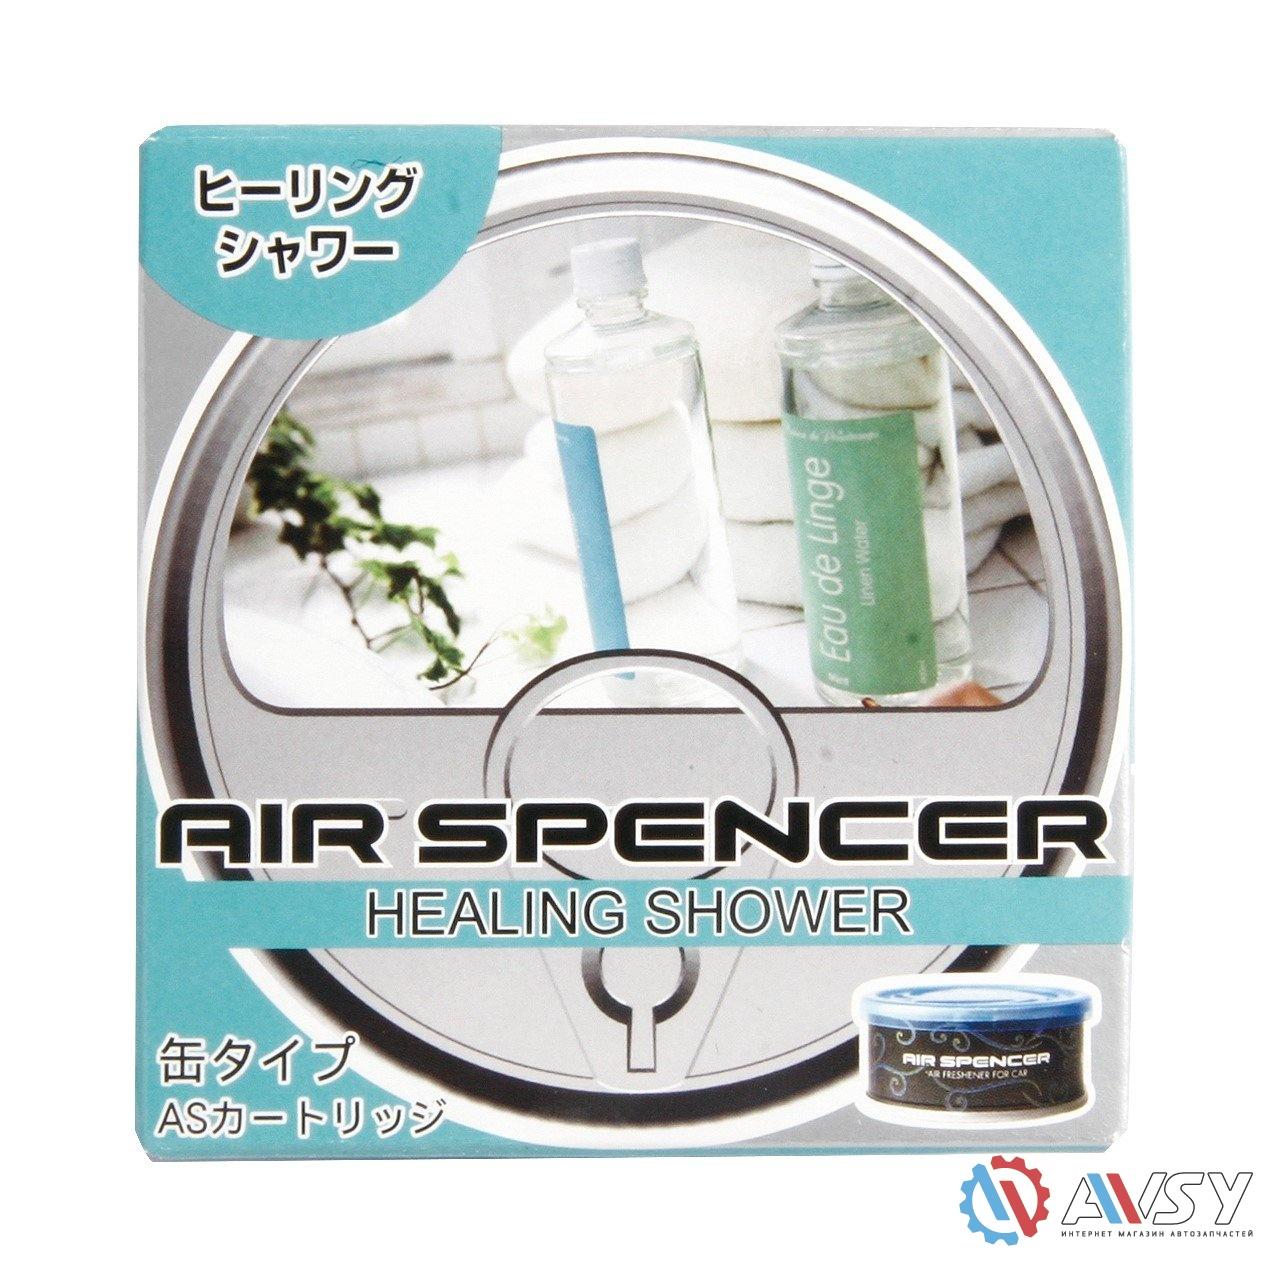 EIKOSHA SPIRIT REFILL-HEALING SHOWER Ароматизатор меловой исцеляющая влага